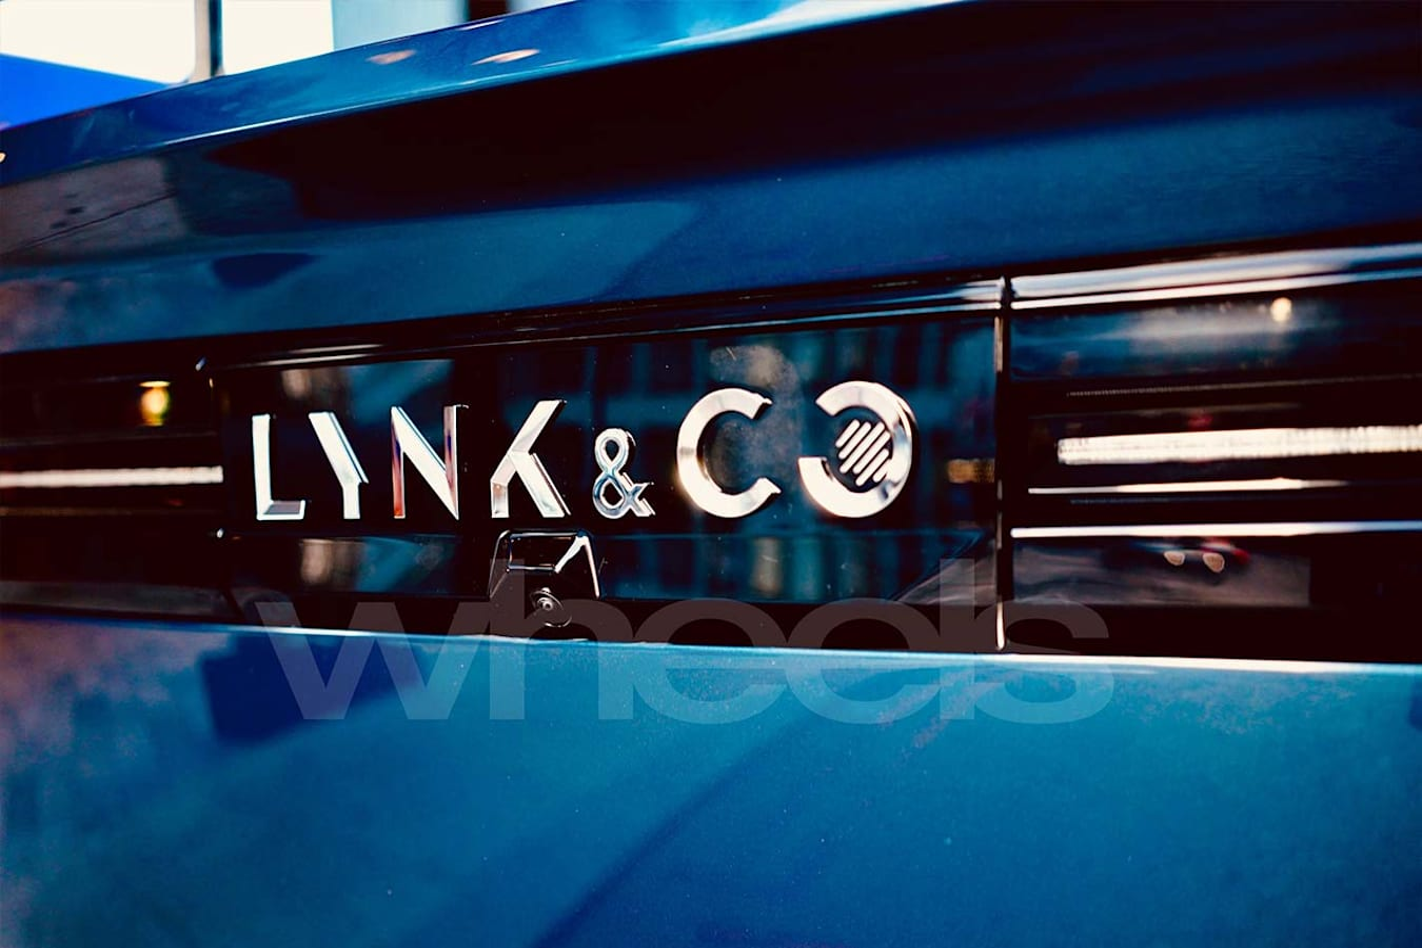 Lynk & Co badge